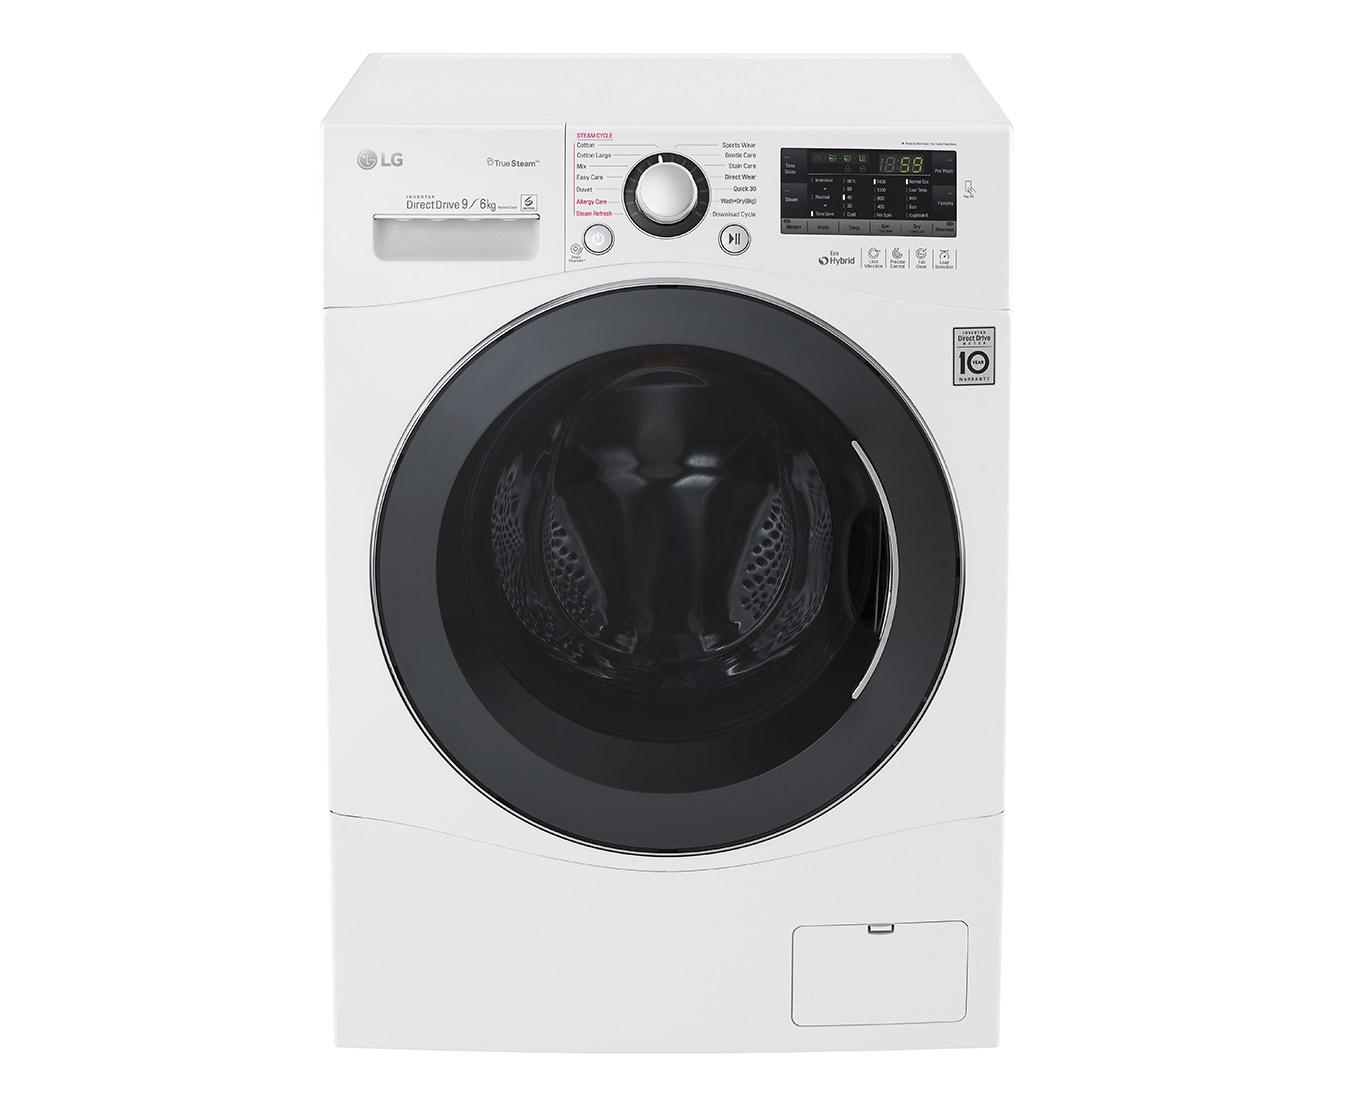 LG mašina za pranje i sušenje FH4A8FDH2N - Inelektronik